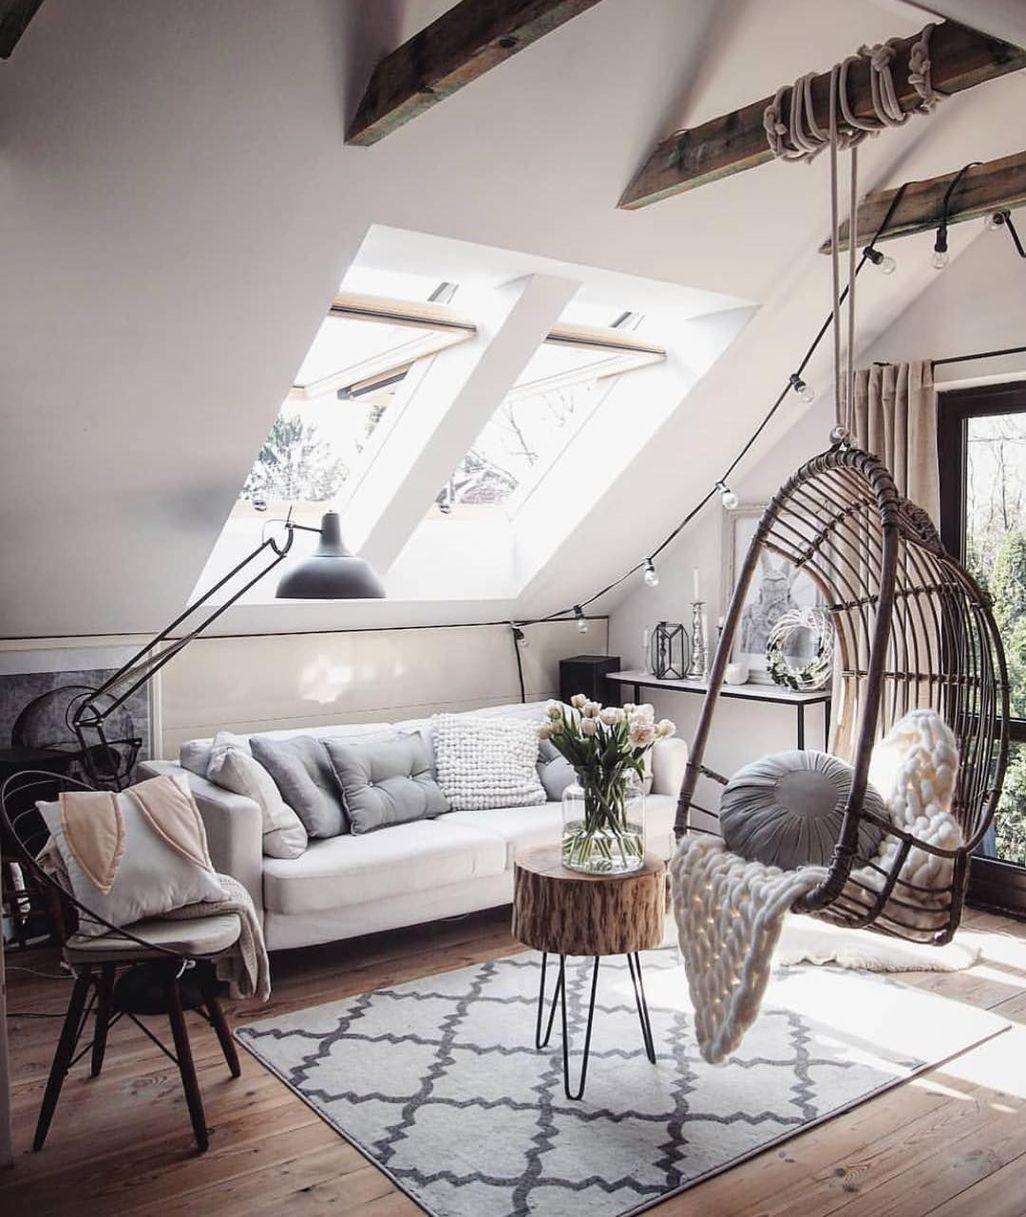 modern hanging swing chair stand indoor decor furniture design